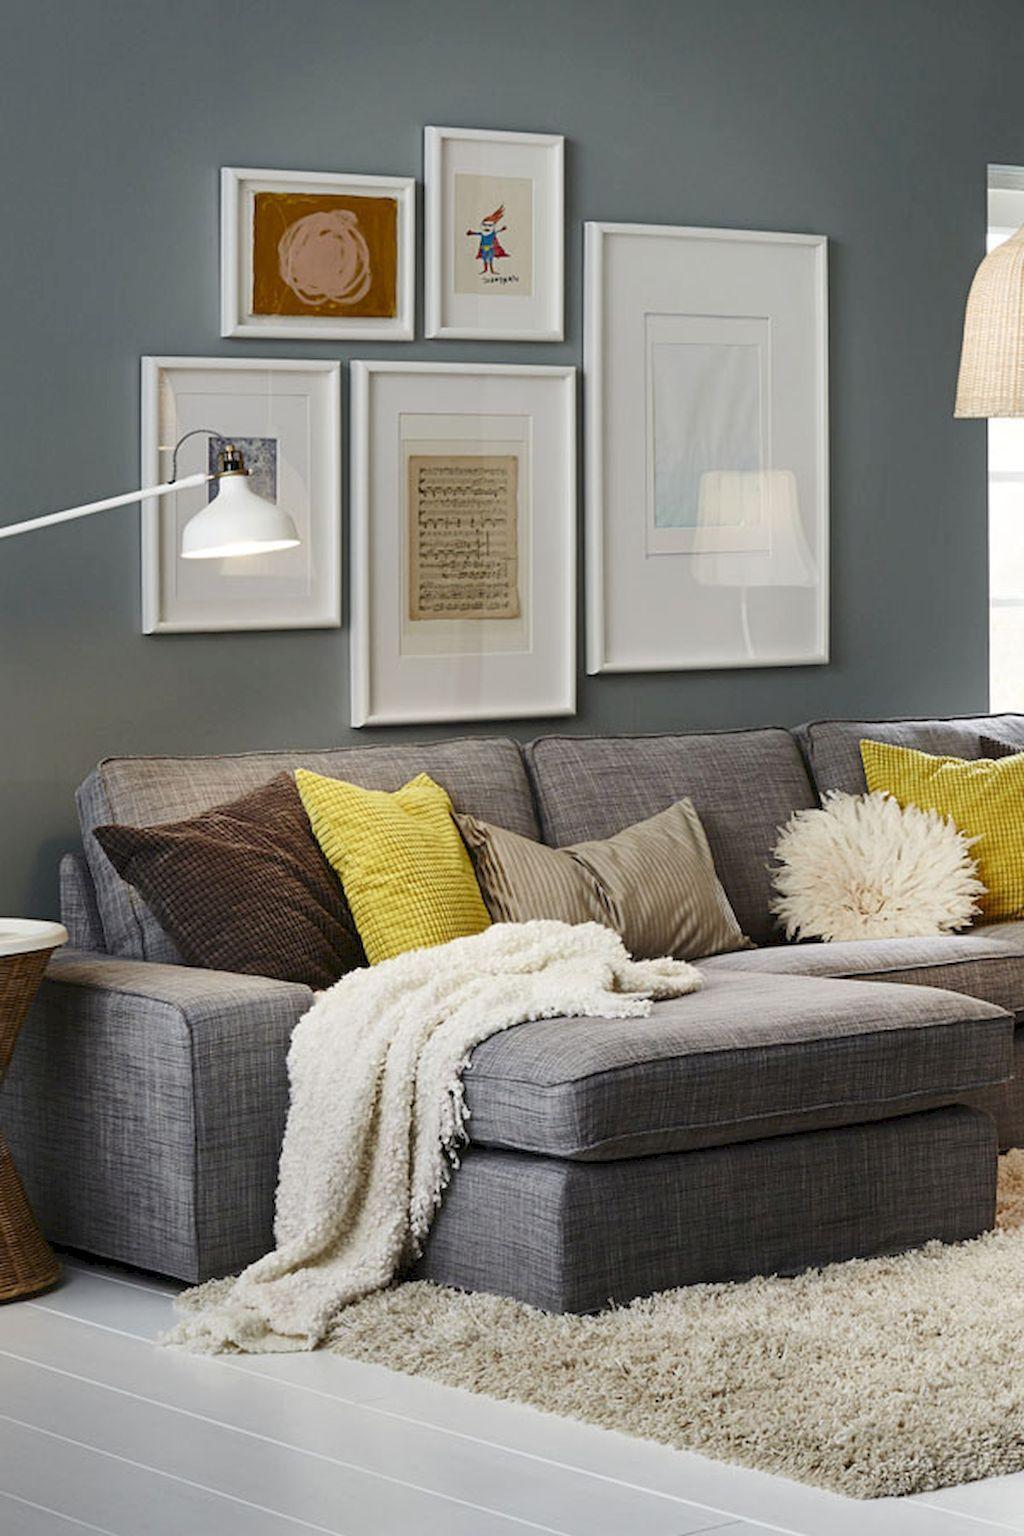 Cozy Minimalist Living Room Design Ideas (32)